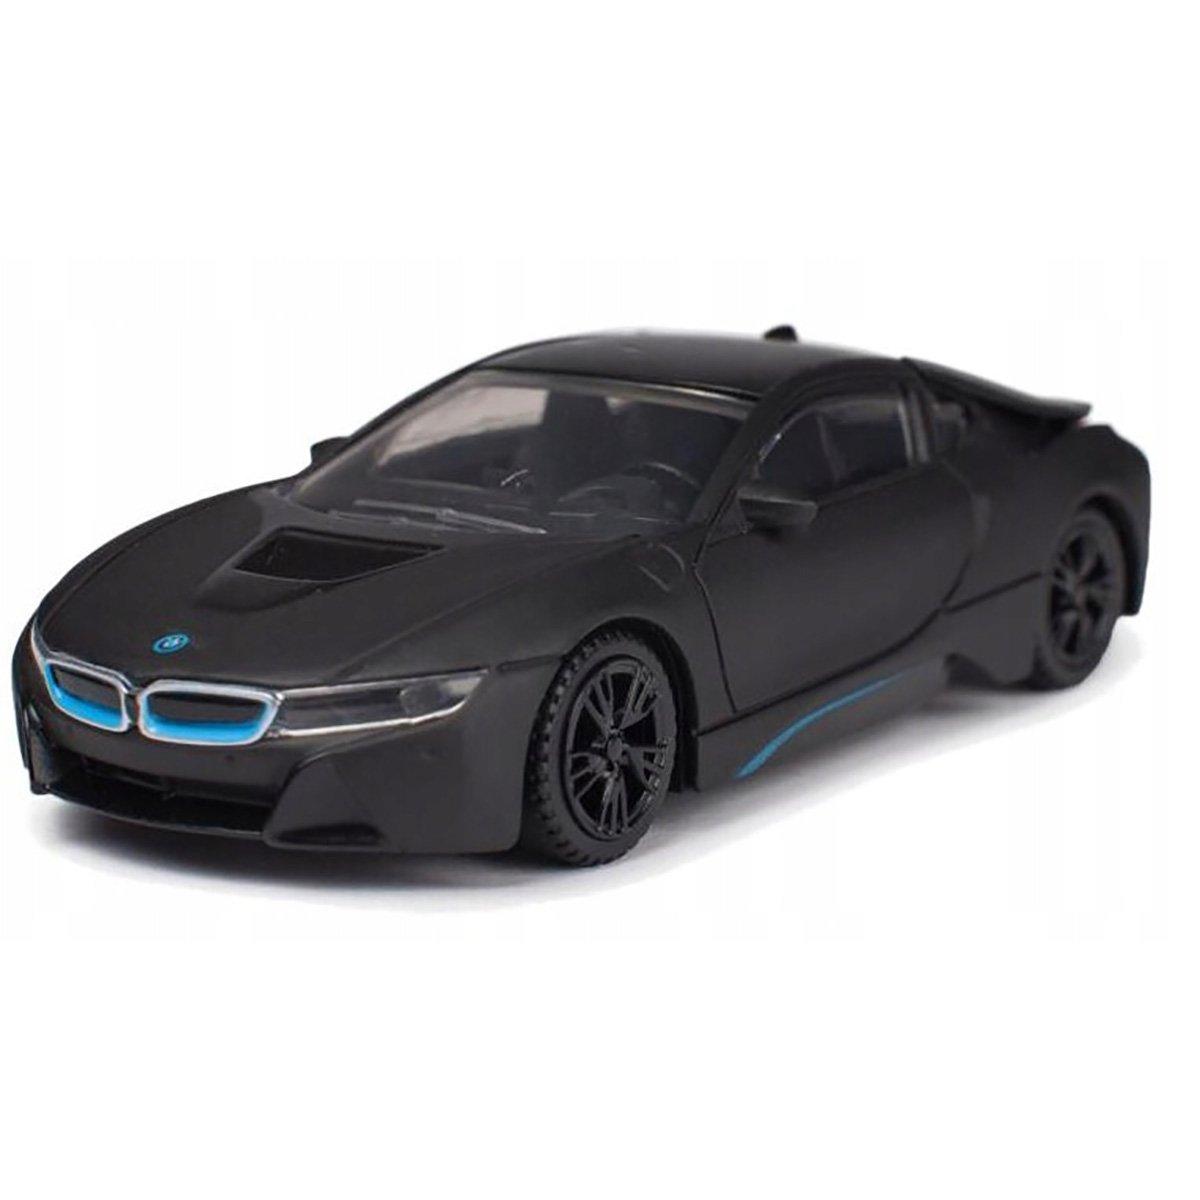 Masinuta Rastar BMW I8, Negru, 1:43